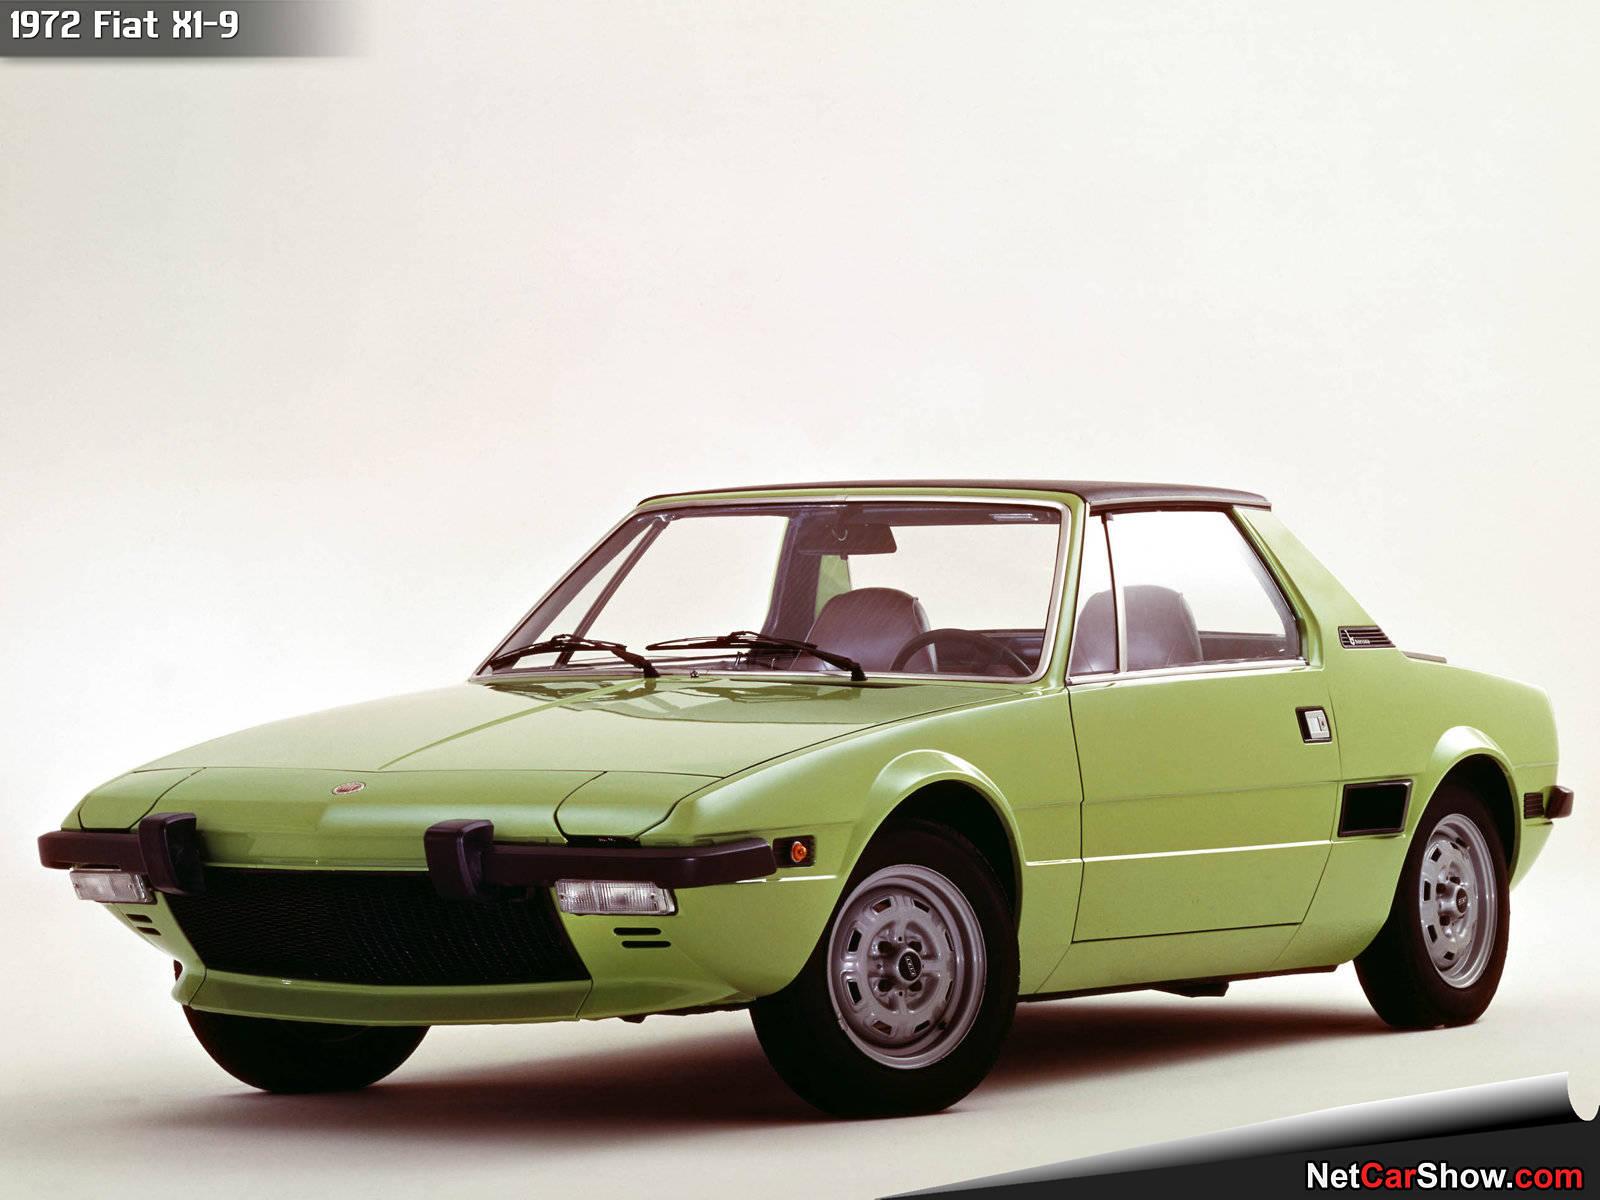 Fiat-X1-9-1972-1600-02.jpg